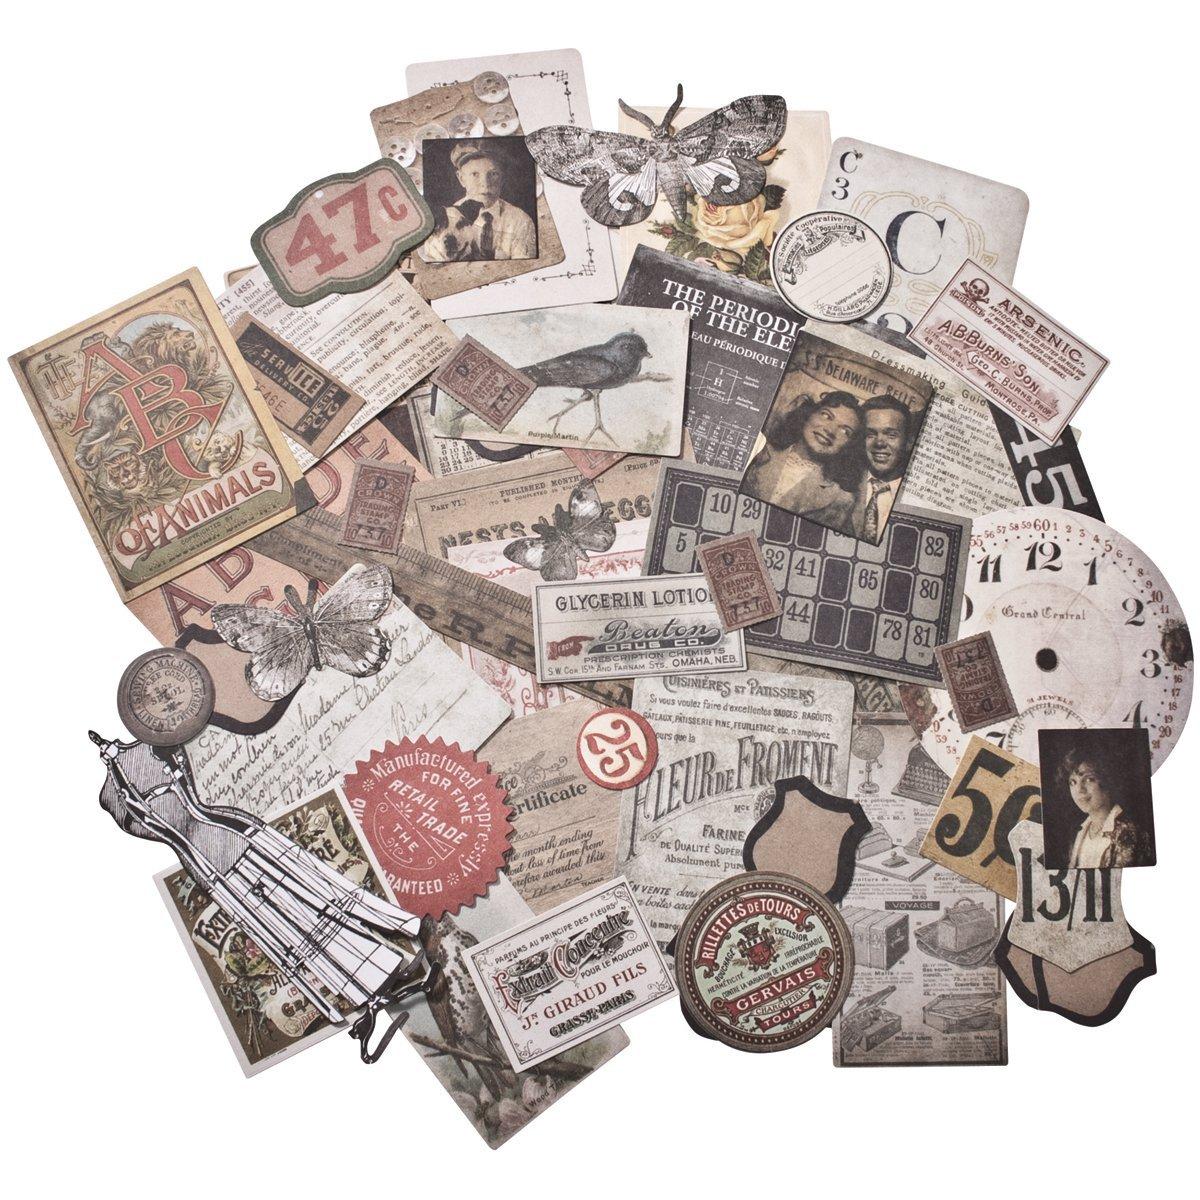 Tim Holtz Idea-ology Thrift Shop Ephemera Pack, 54 Pieces, TH93114